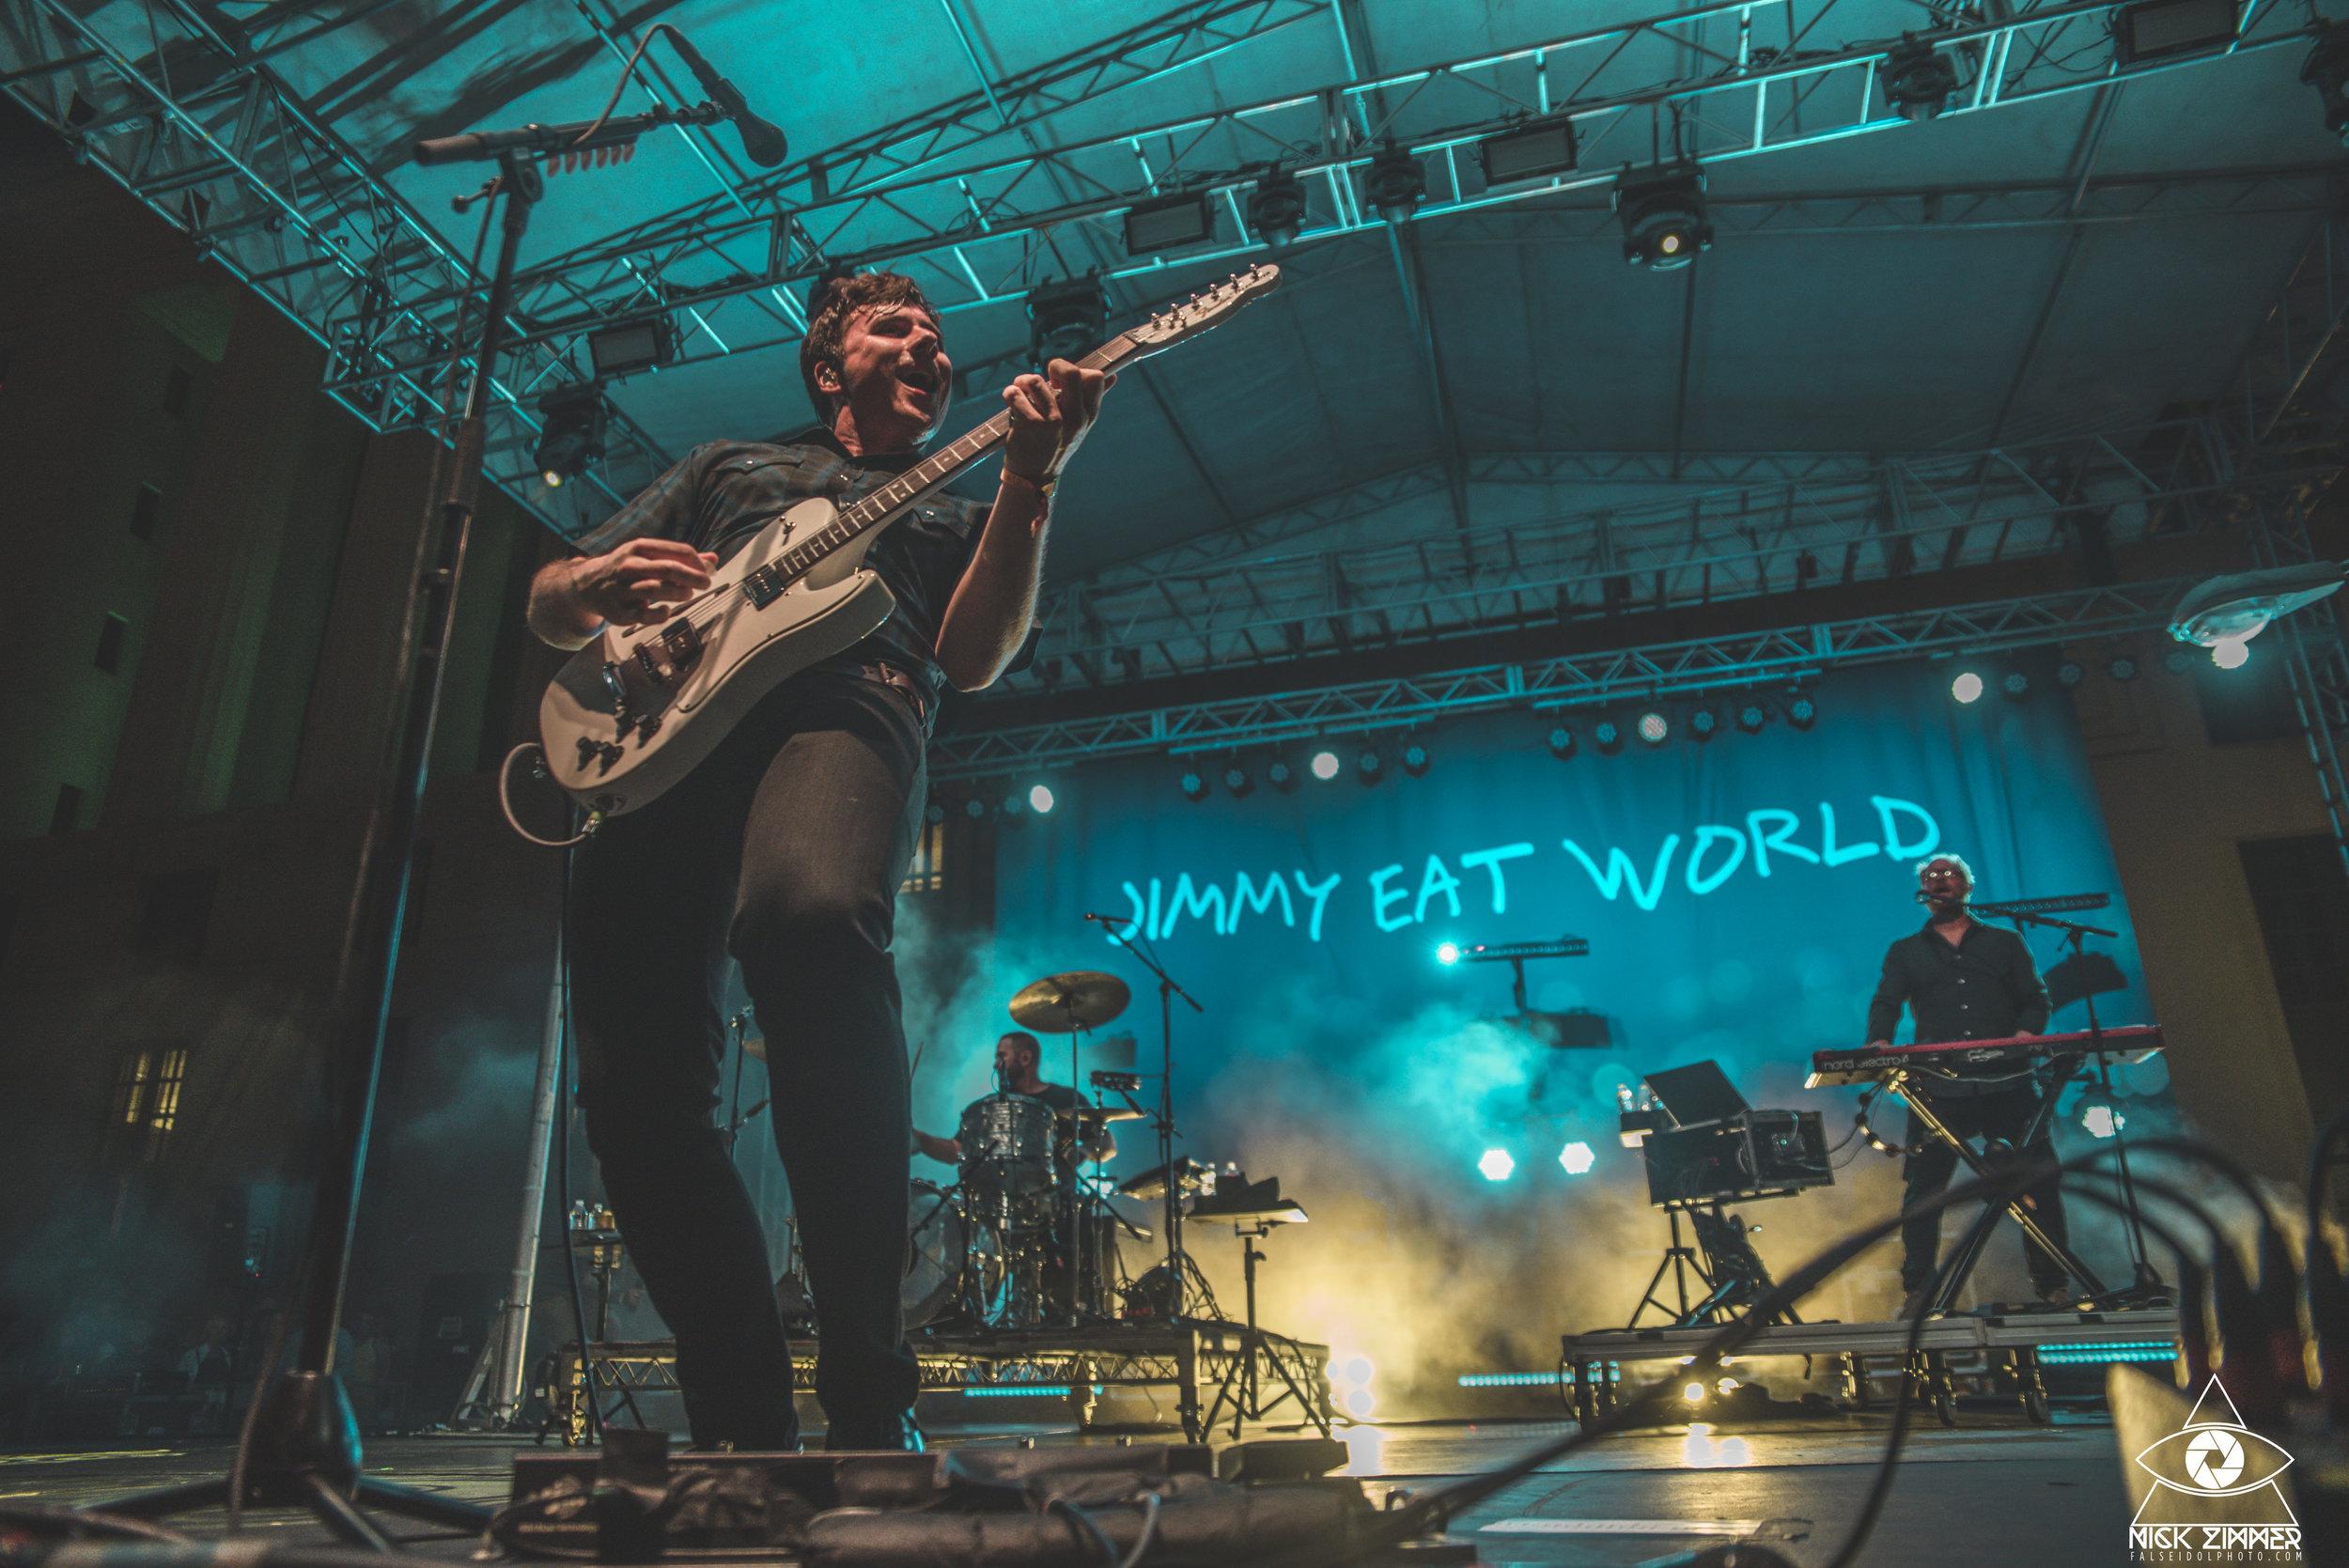 Live On The Green - Venue: Public SquareCity: Nashville, TNDate: September 1, 2018